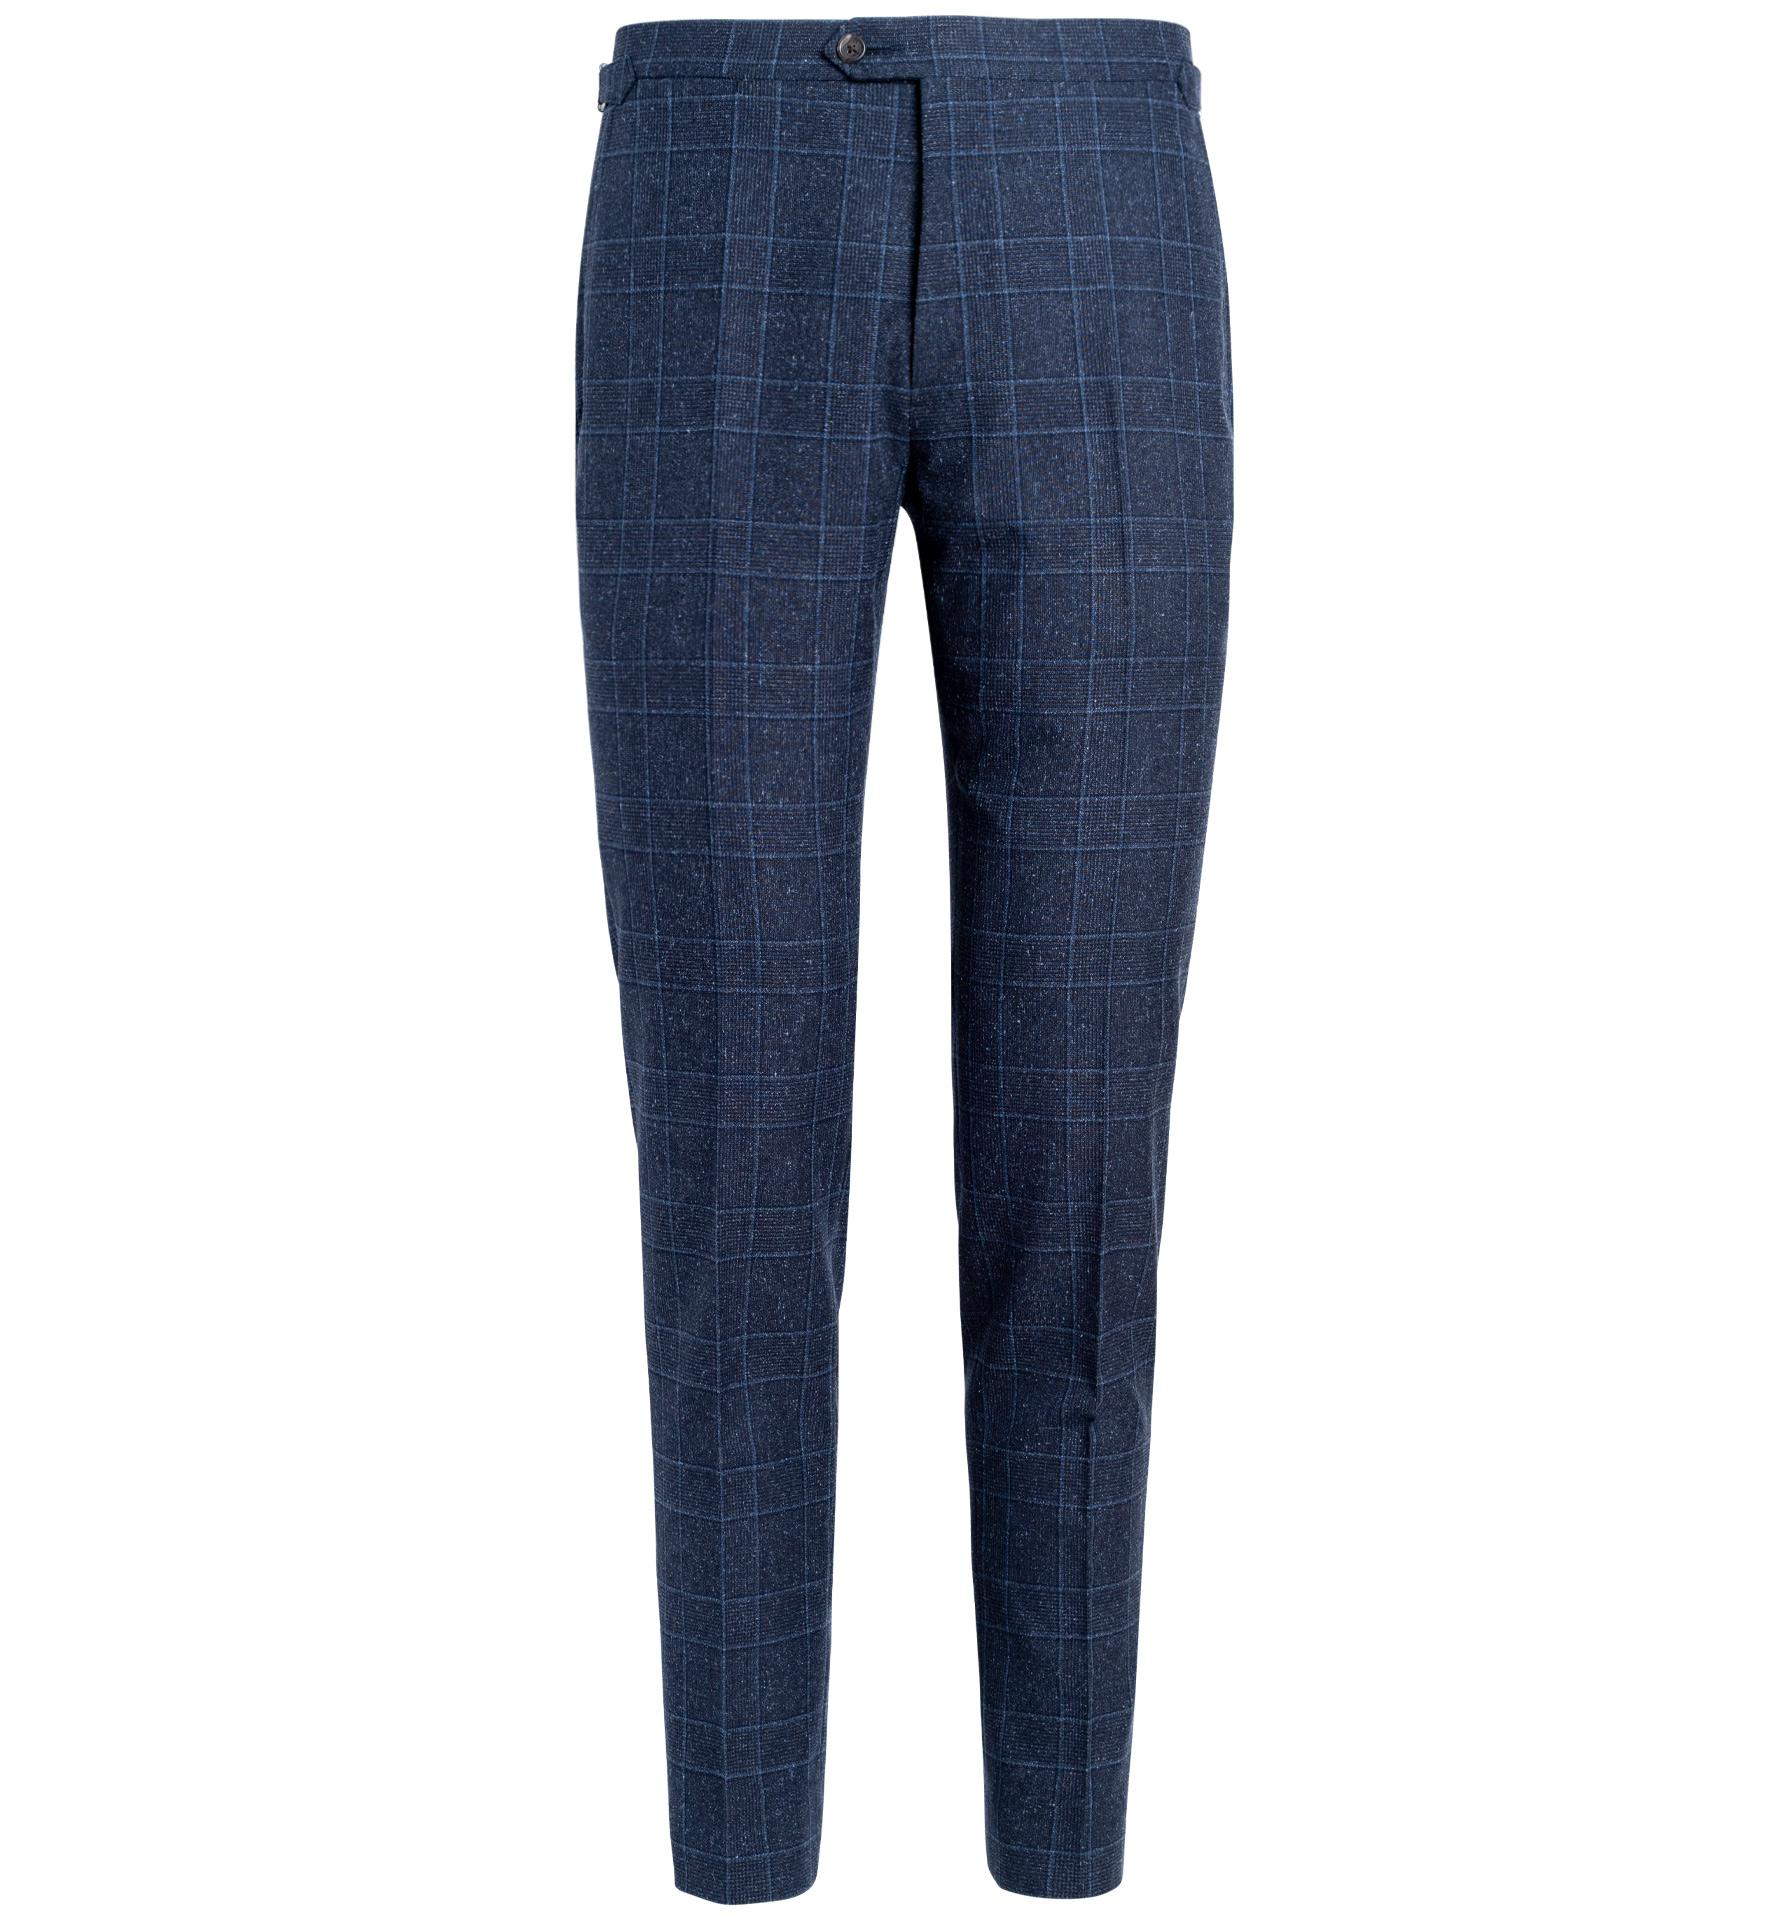 Zoom Image of Allen Navy Glen Plaid Wool and Silk Trouser